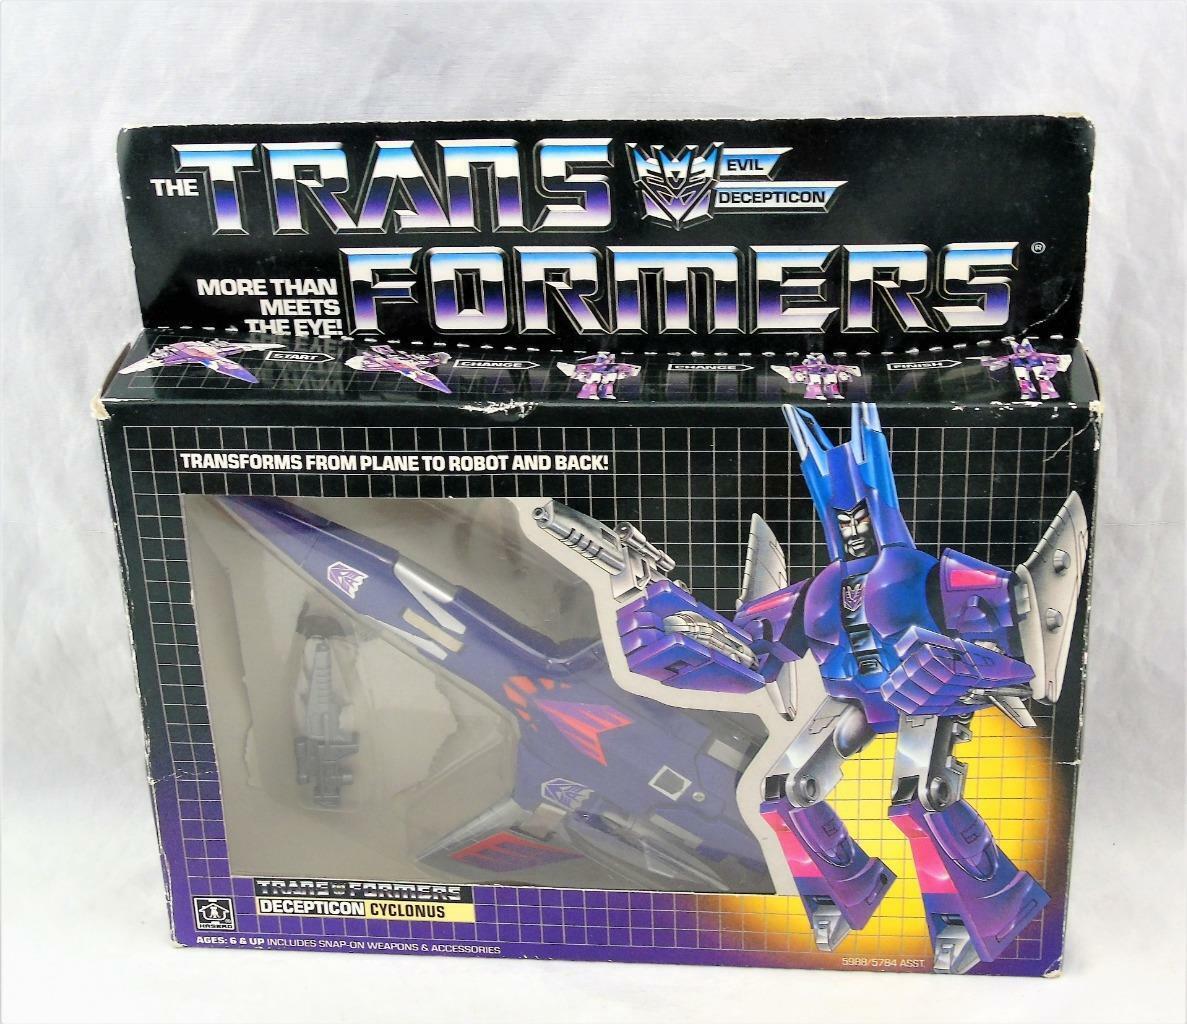 Transformers Original G1 1986 1986 1986 Cyclonus Complete w  Box and Bubble Nice Figure a43f25